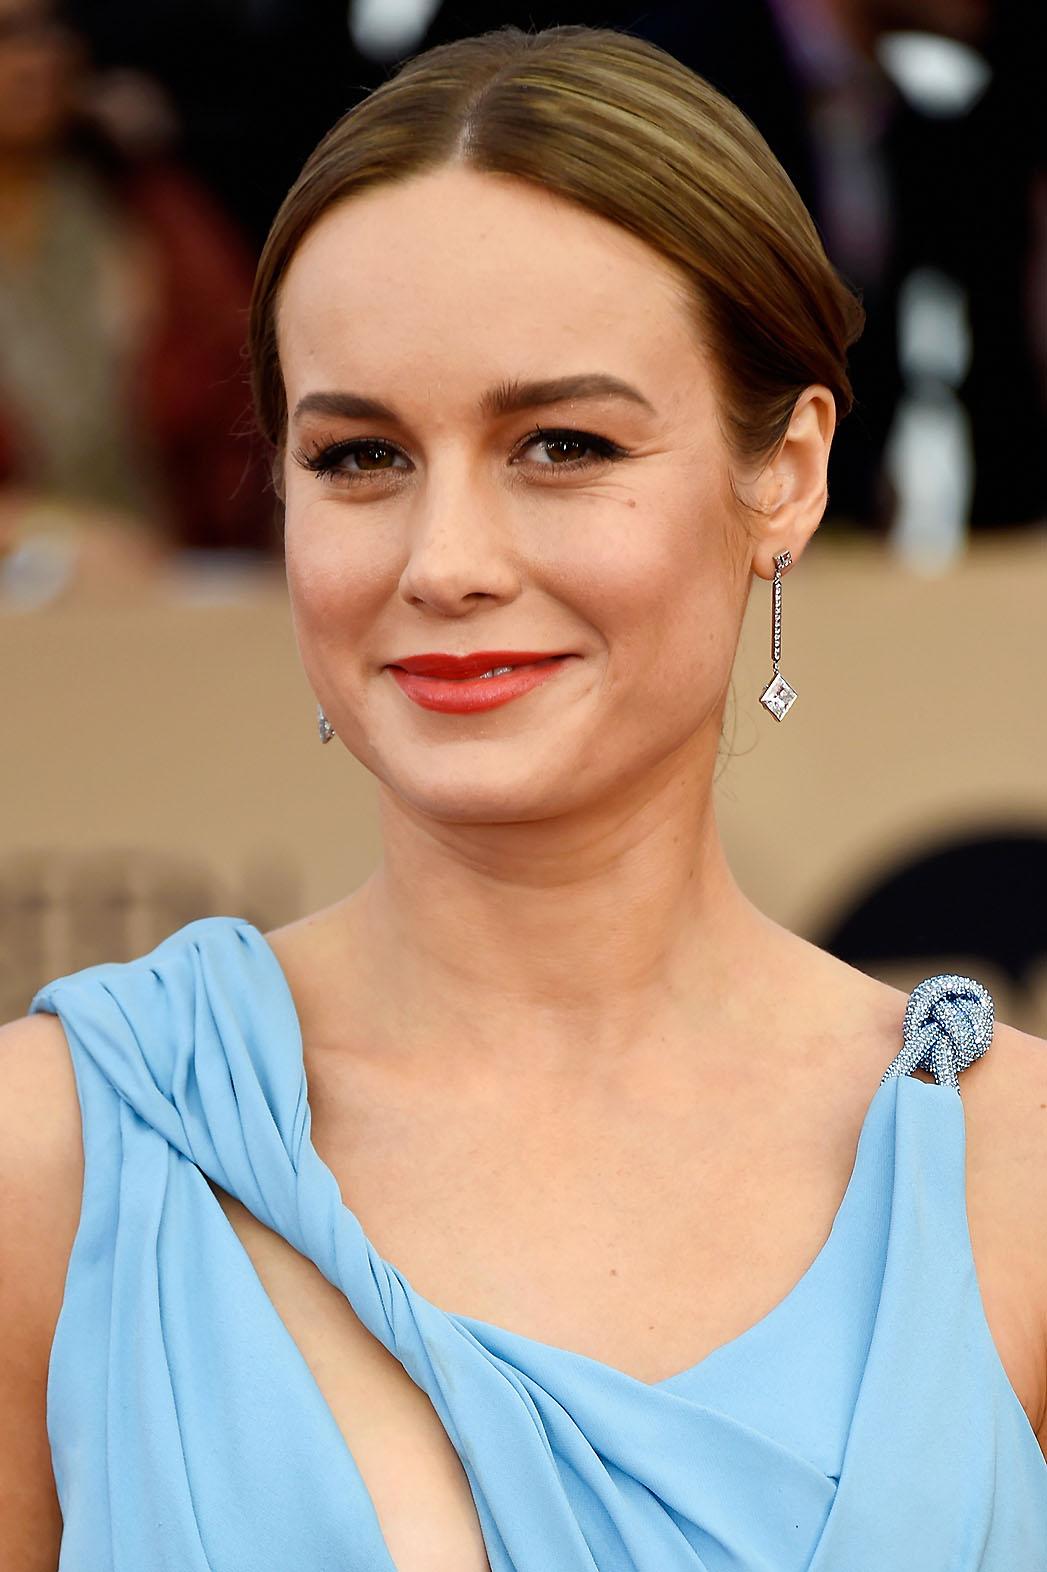 Brie Larson 22nd Annual Screen Actors Guild Awards makeup - P 2016